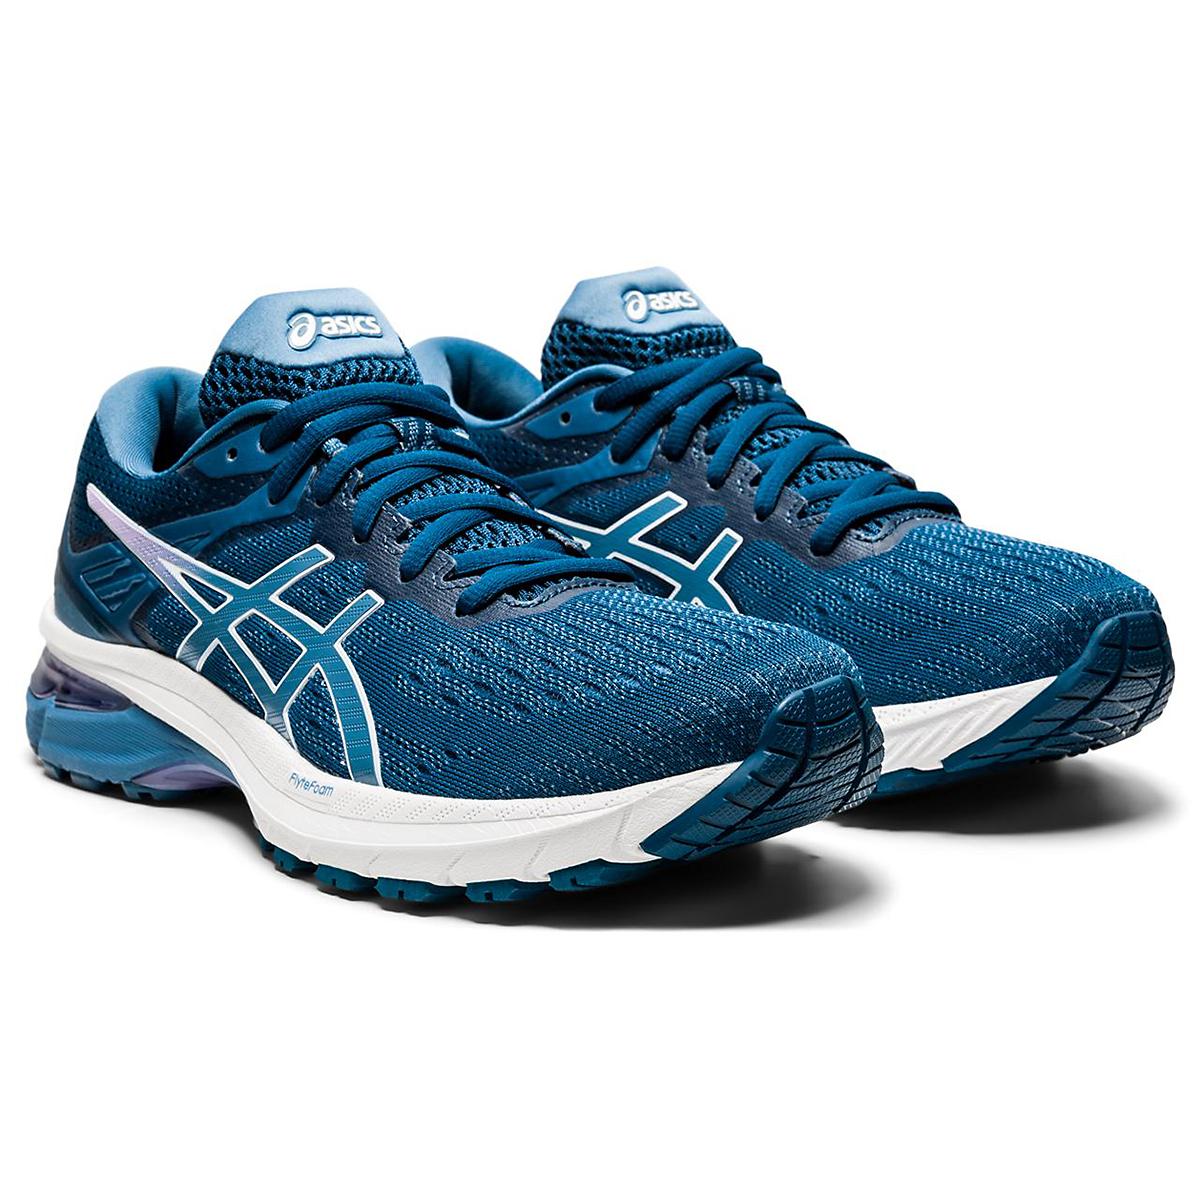 Women's Asics Gt-2000 9 Running Shoe - Color: Mako Blue/Grey Floss - Size: 5 - Width: Regular, Mako Blue/Grey Floss, large, image 5